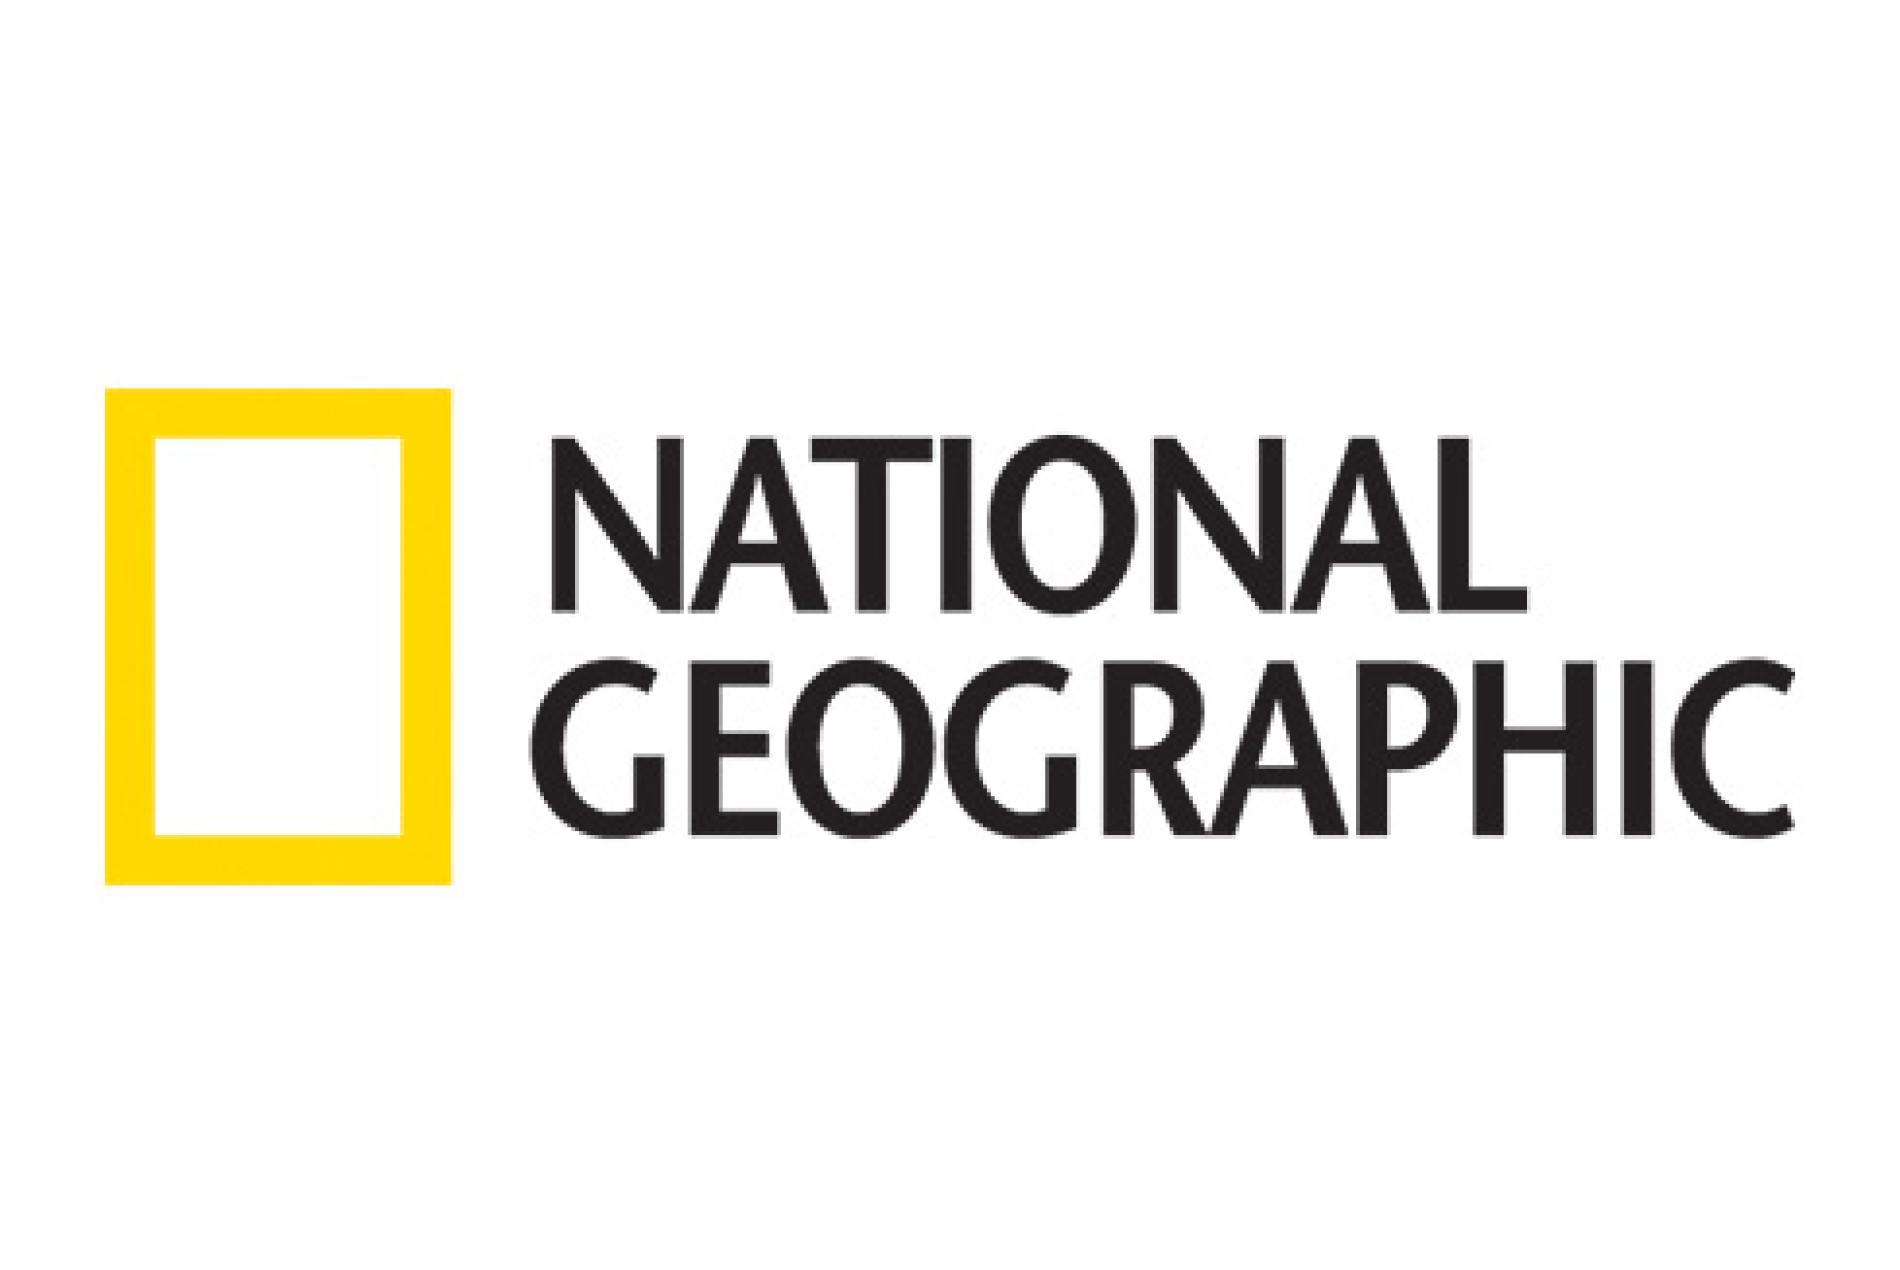 nat-geo-vector-logo-png-national-geographic-channel-logo-png-pluspng-com-1900-national-geographic-channel-logo-1900.jpg